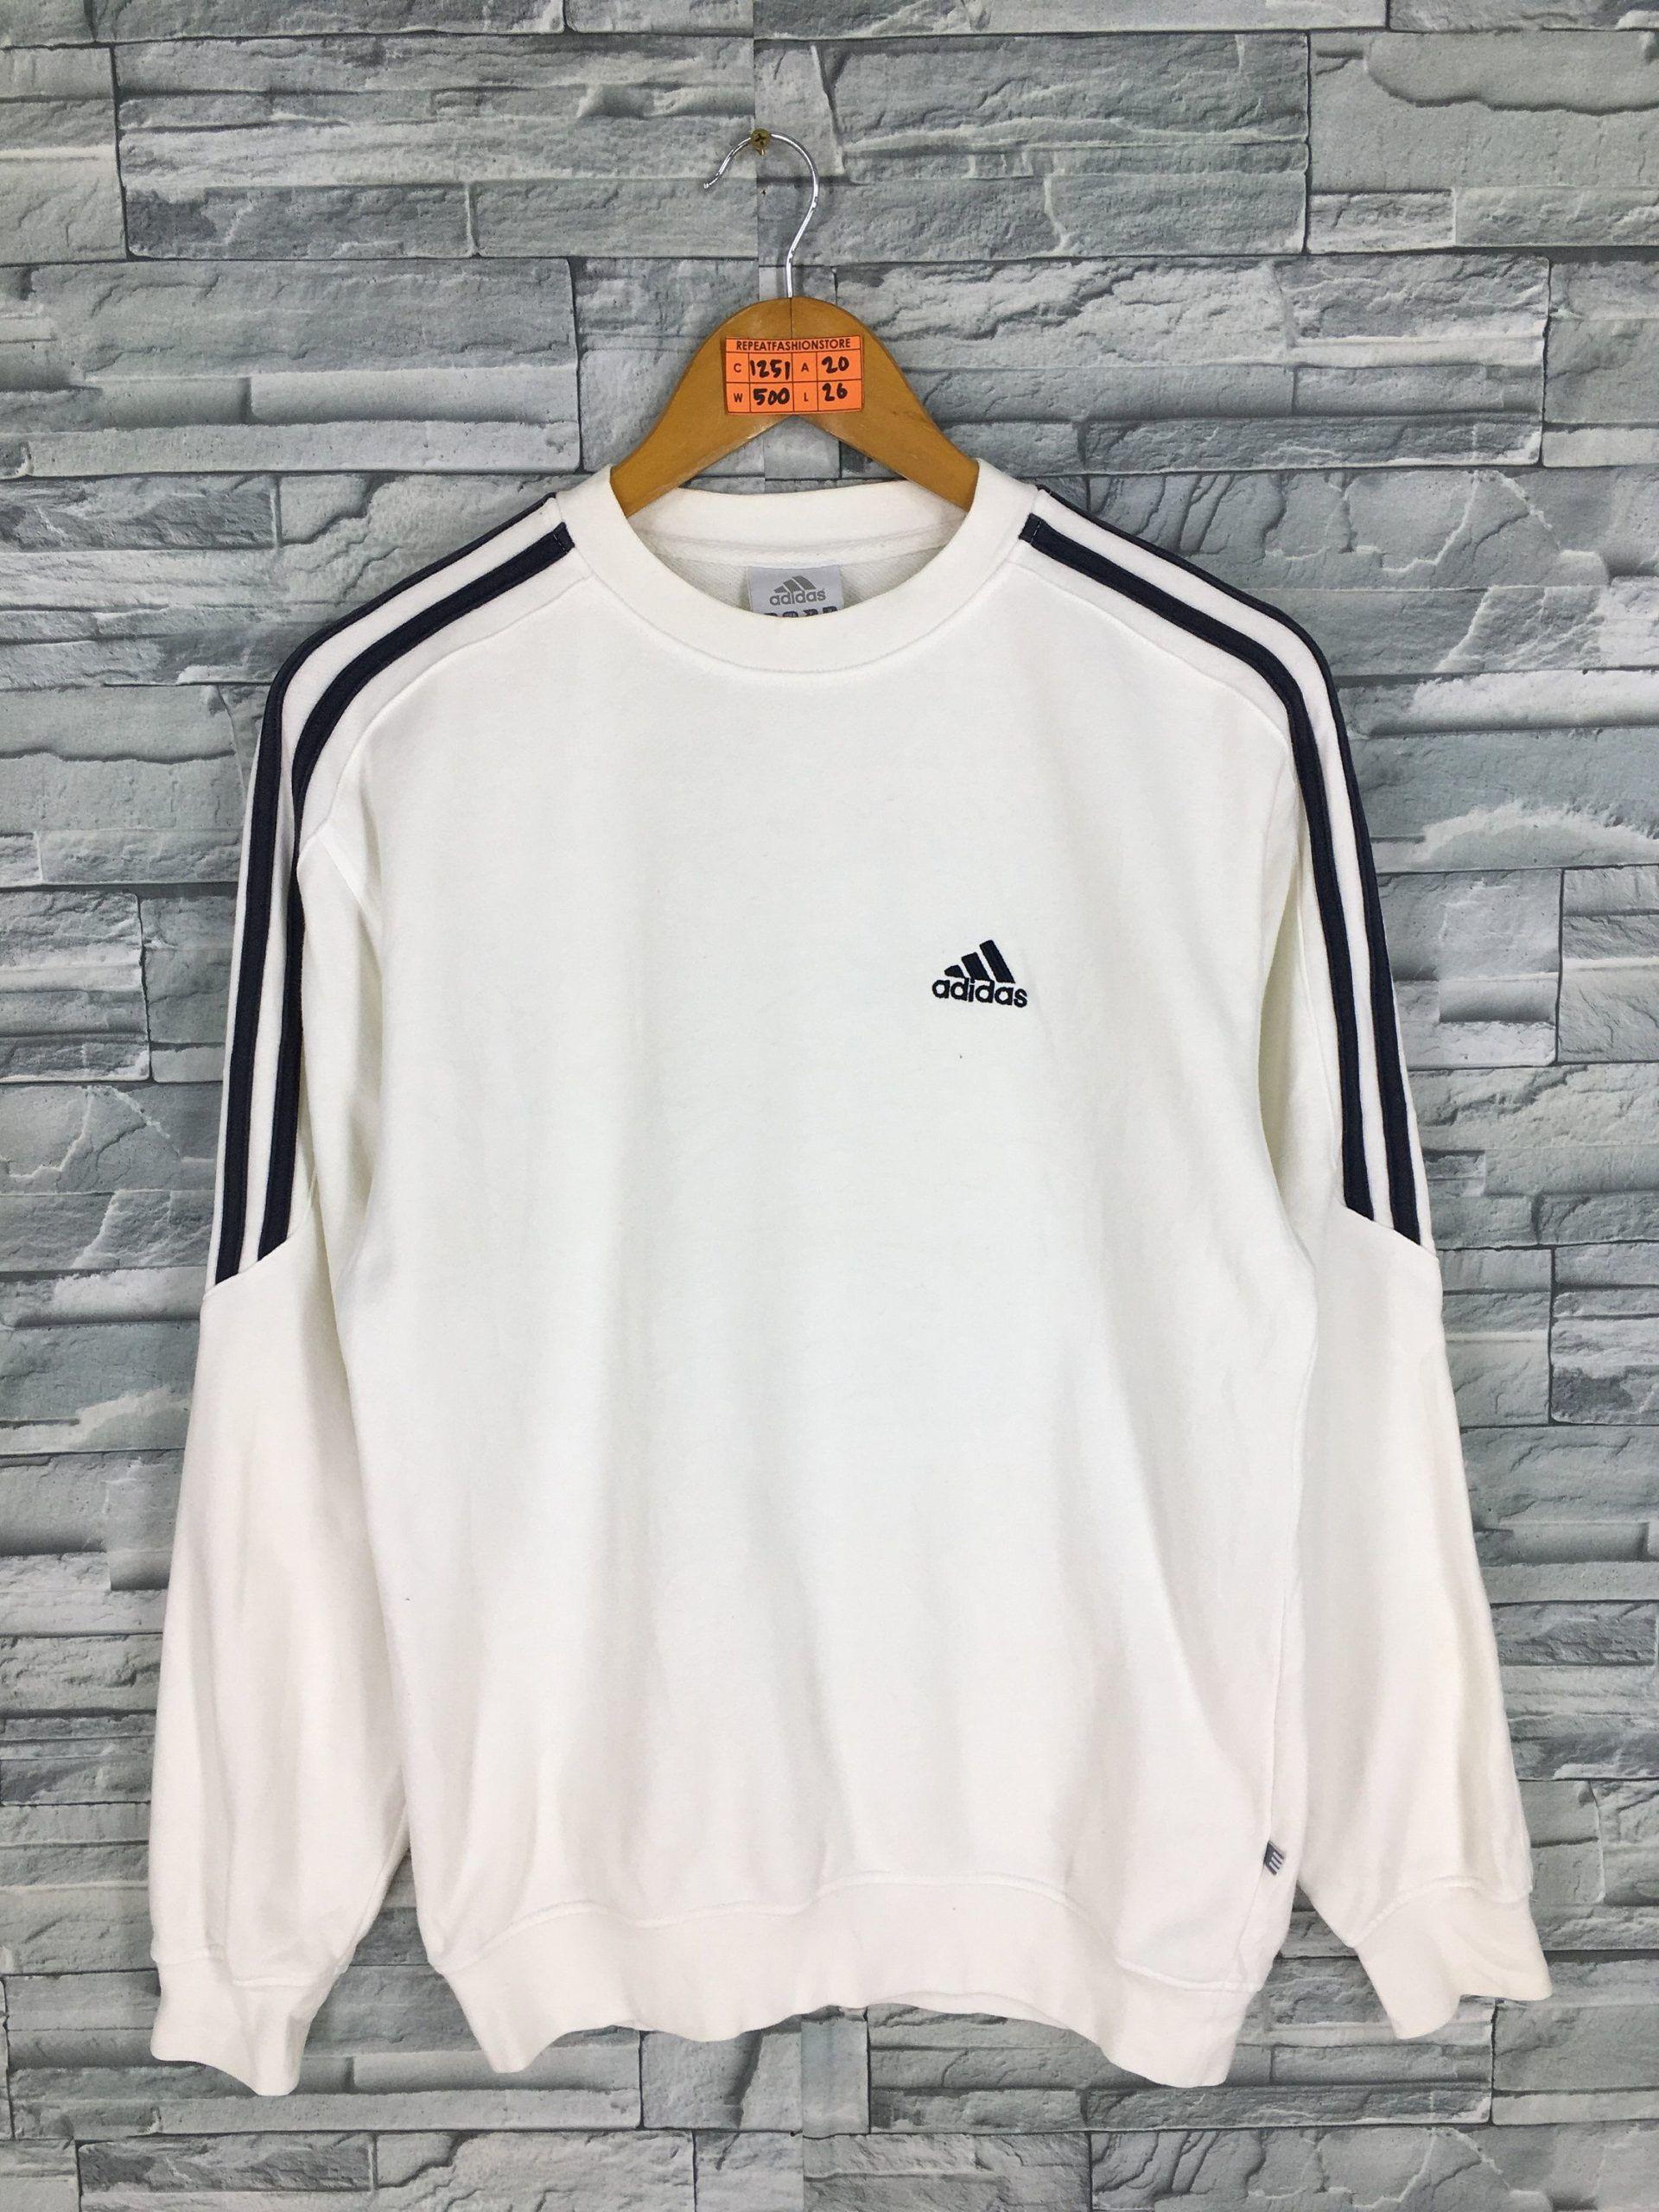 Vintage 90s Adidas Crewneck Sweatshirt Small White Adidas Equipment Three Stripes Sportswear Adidas Sport In 2020 Adidas Sweatshirt Outfits Hype Clothing Nike Casual Outfit